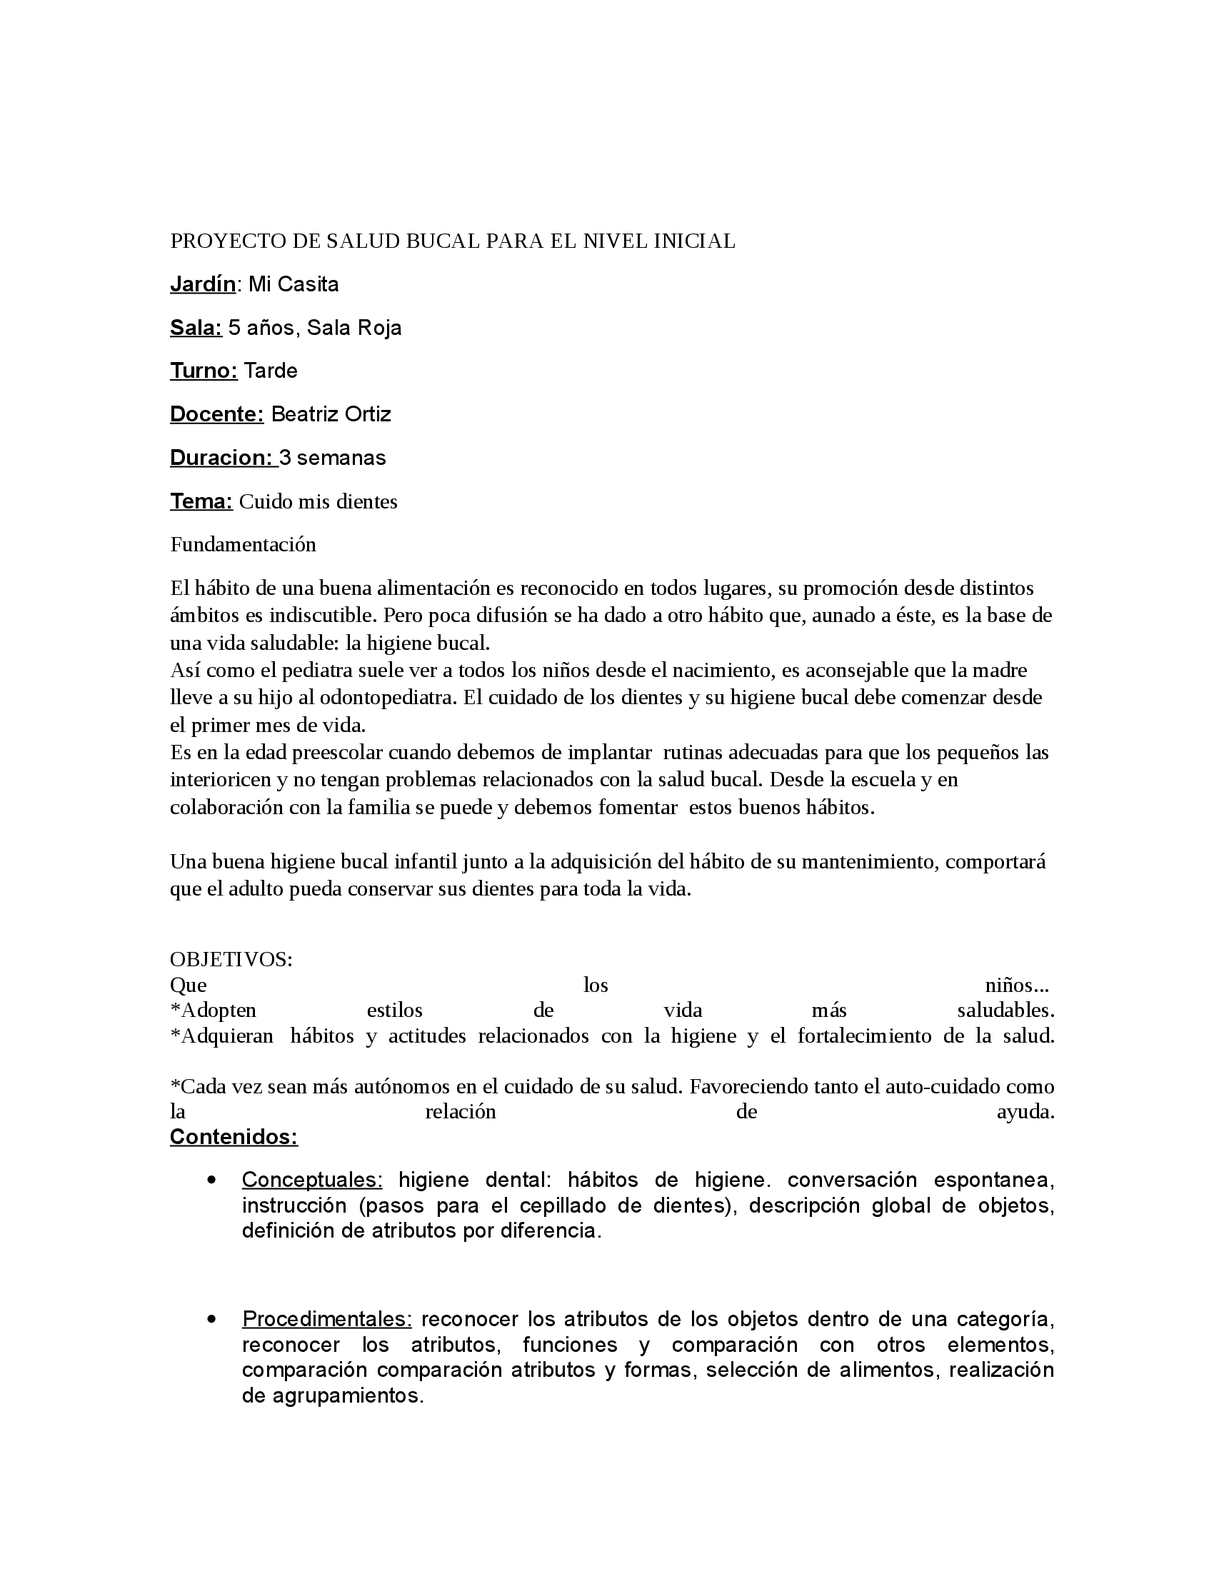 Calaméo - Proyecto de Higiene Bucal para el Nivel Inicial